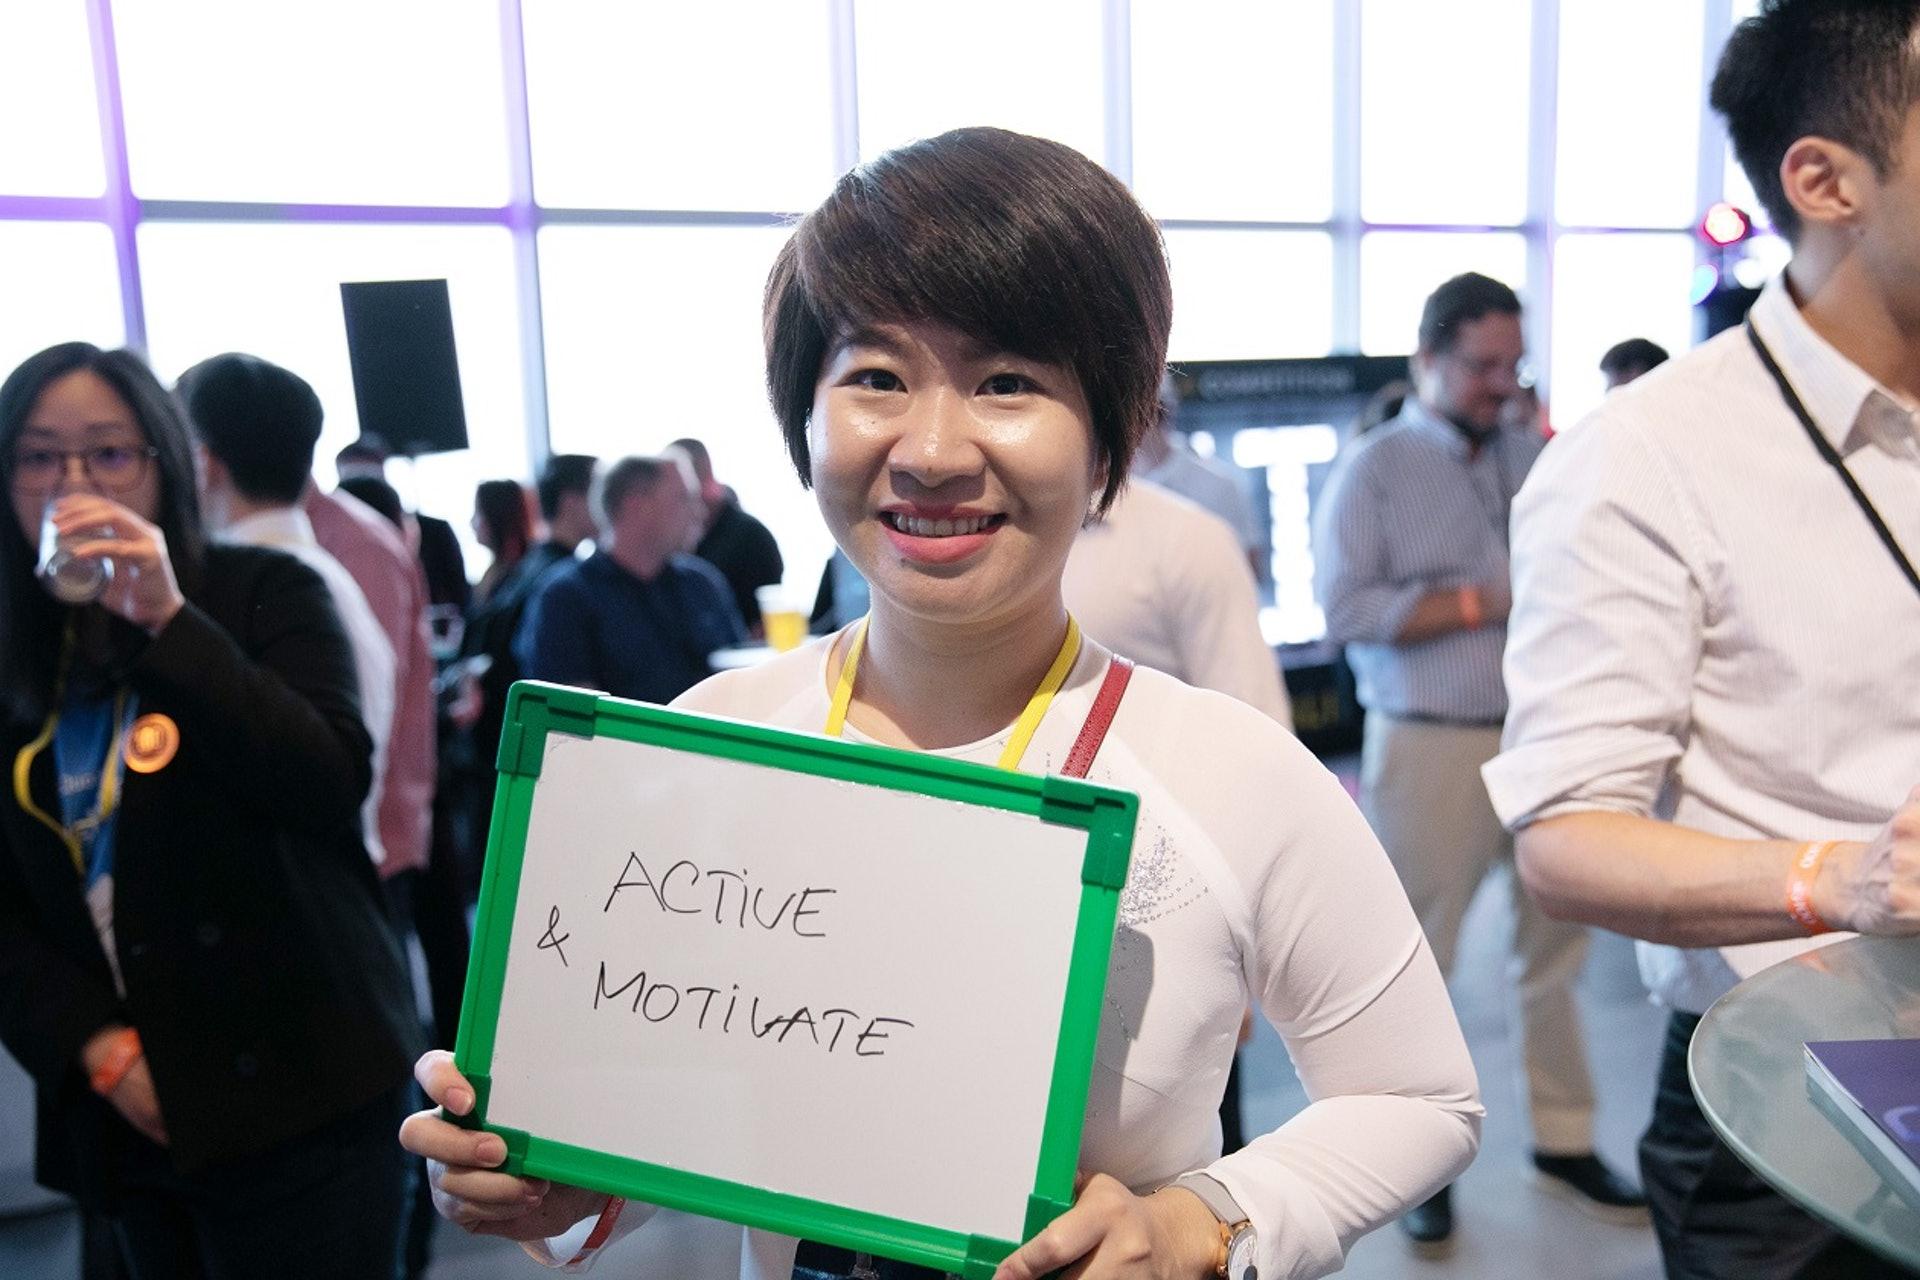 【Active & Motivate】來自越南,於新加坡創辦Get Done公司的Pham Lan Khanh,表示很高興自己能以東南亞創企的身份參加在香港舉辦的大型創業活動,又指在會場中結識了一些投資者及來自世界各地的創企單位,對香港能凝聚這麼熱鬧的創業氣氛感興奮。